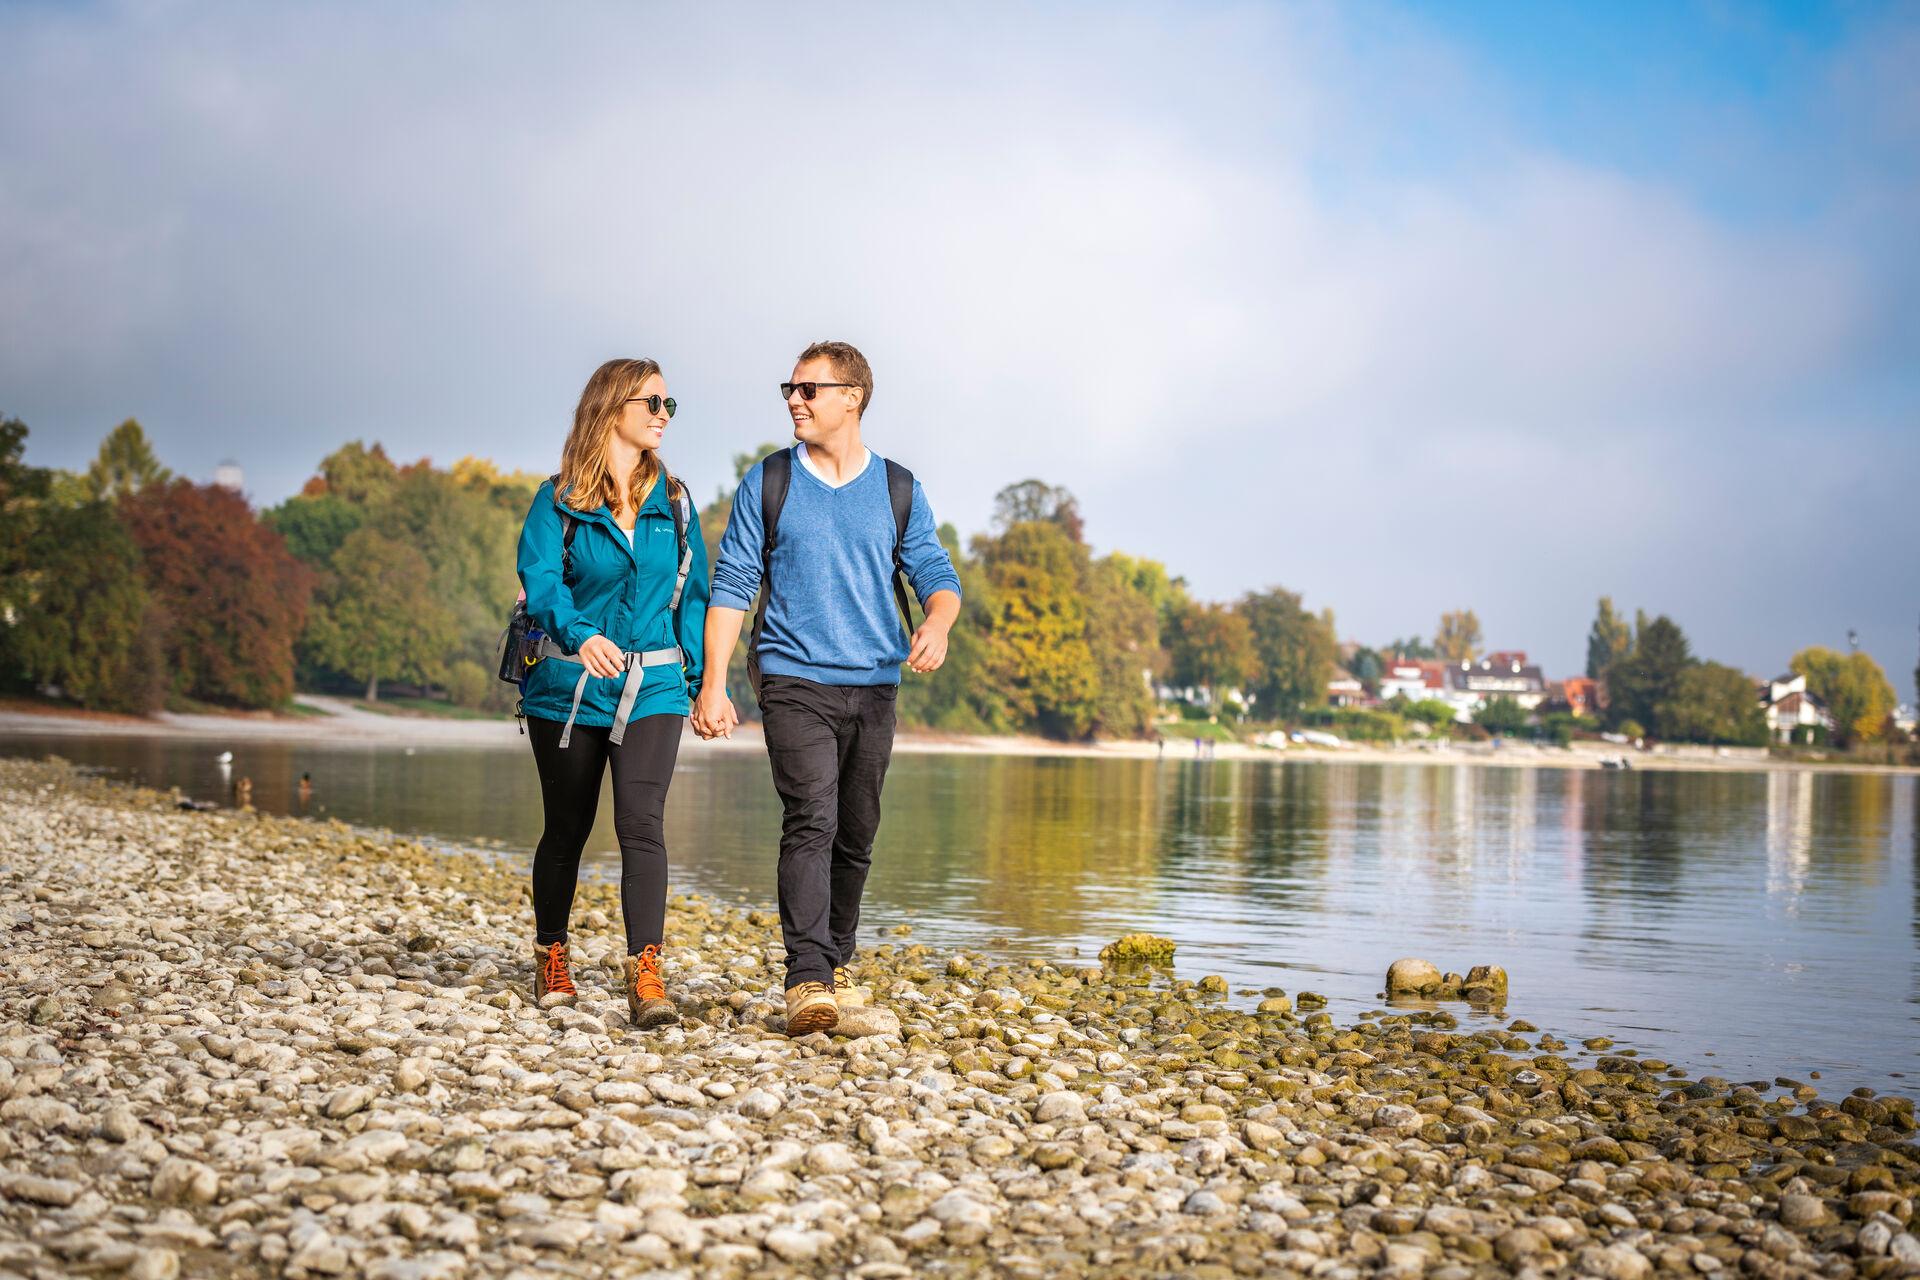 Konstanz-Bodensee-Ausflug-Spaziergang-Wandern-Seeufer-Strand-01_Herbst_Copyright_MTK-Dagmar-Schwelle